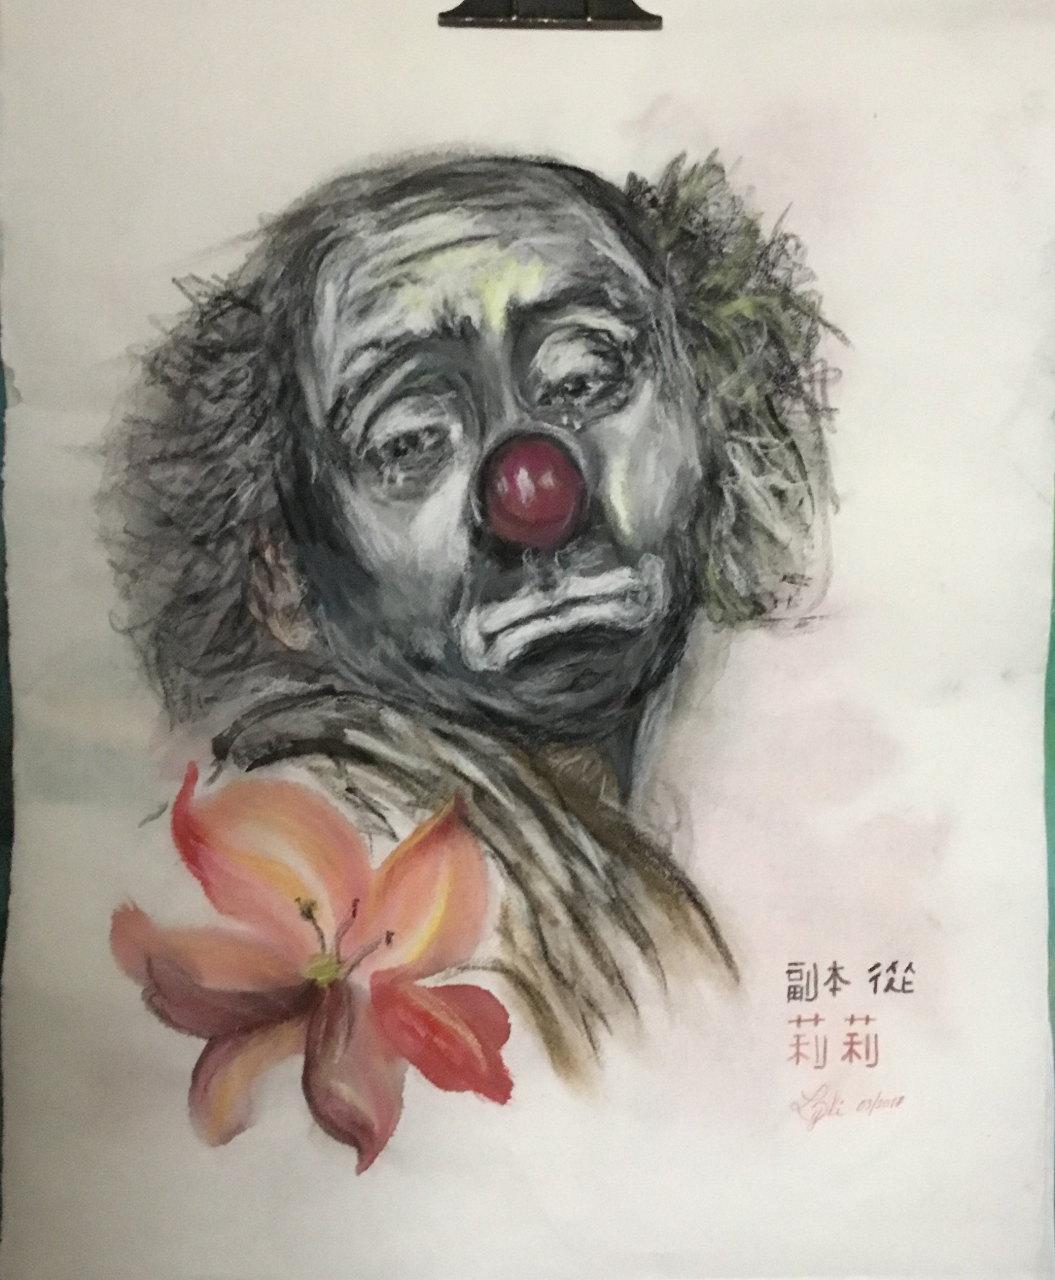 the clown, Liliane Berthelet, France